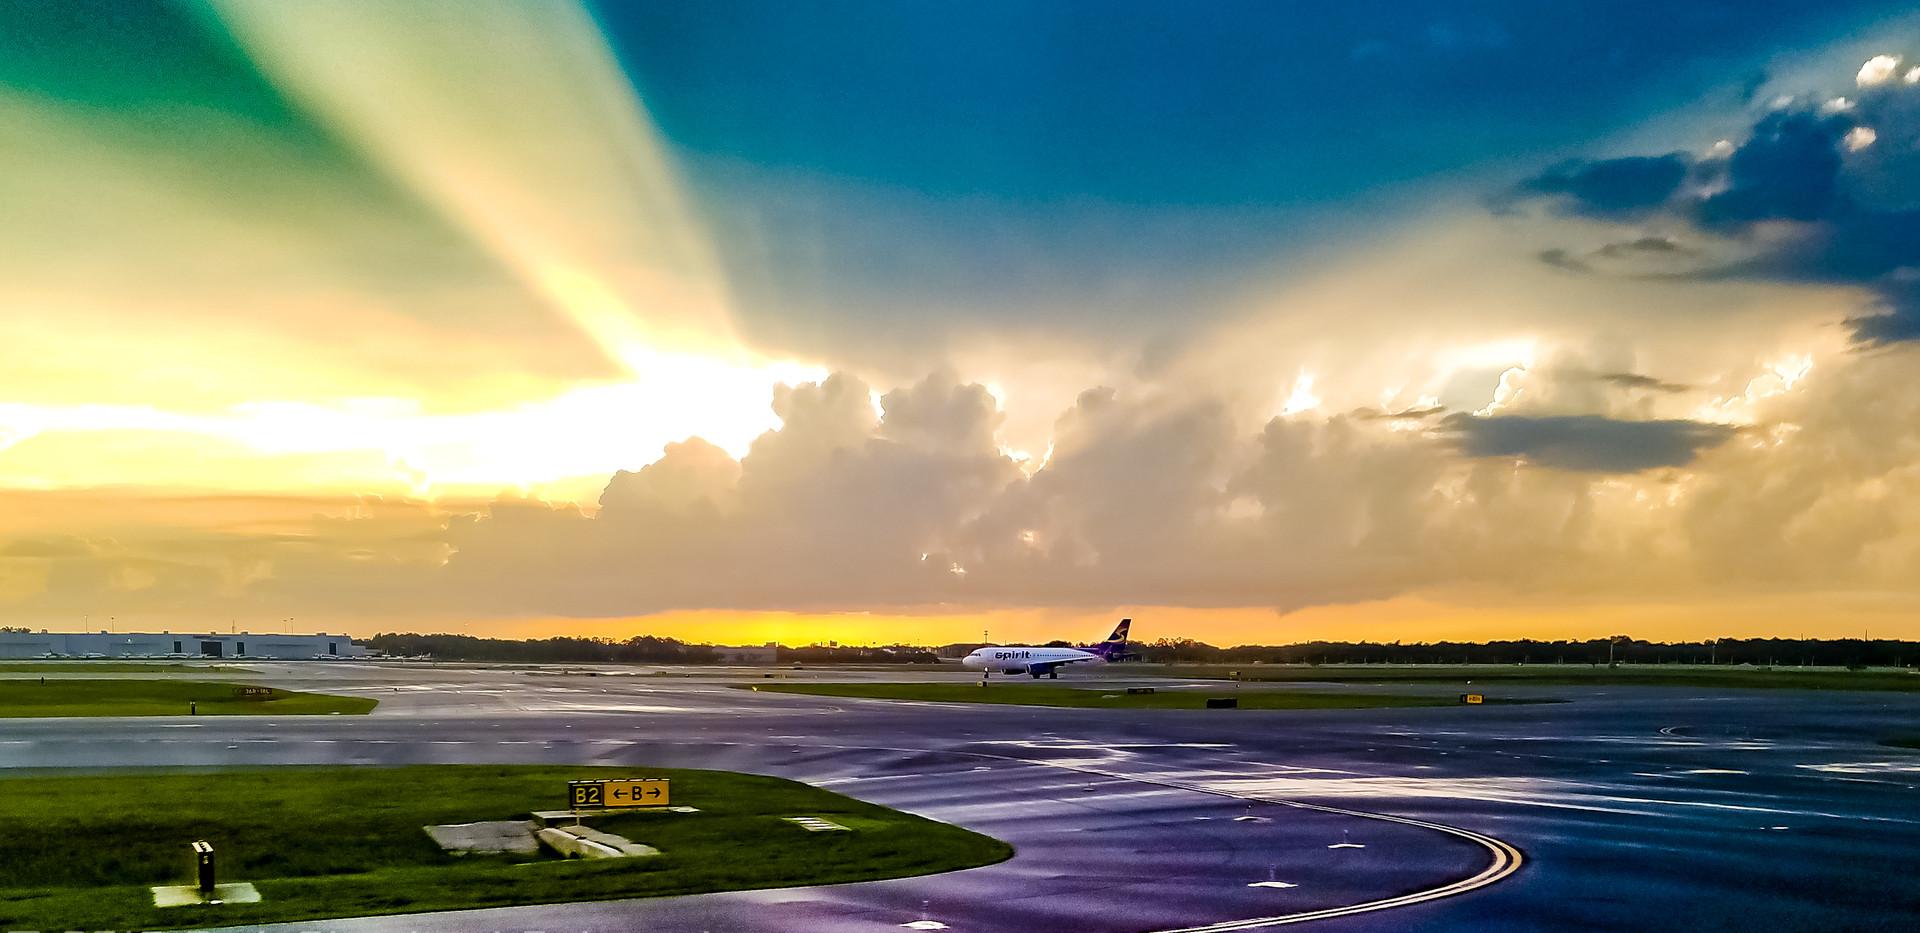 Orlando Airport Summer storm